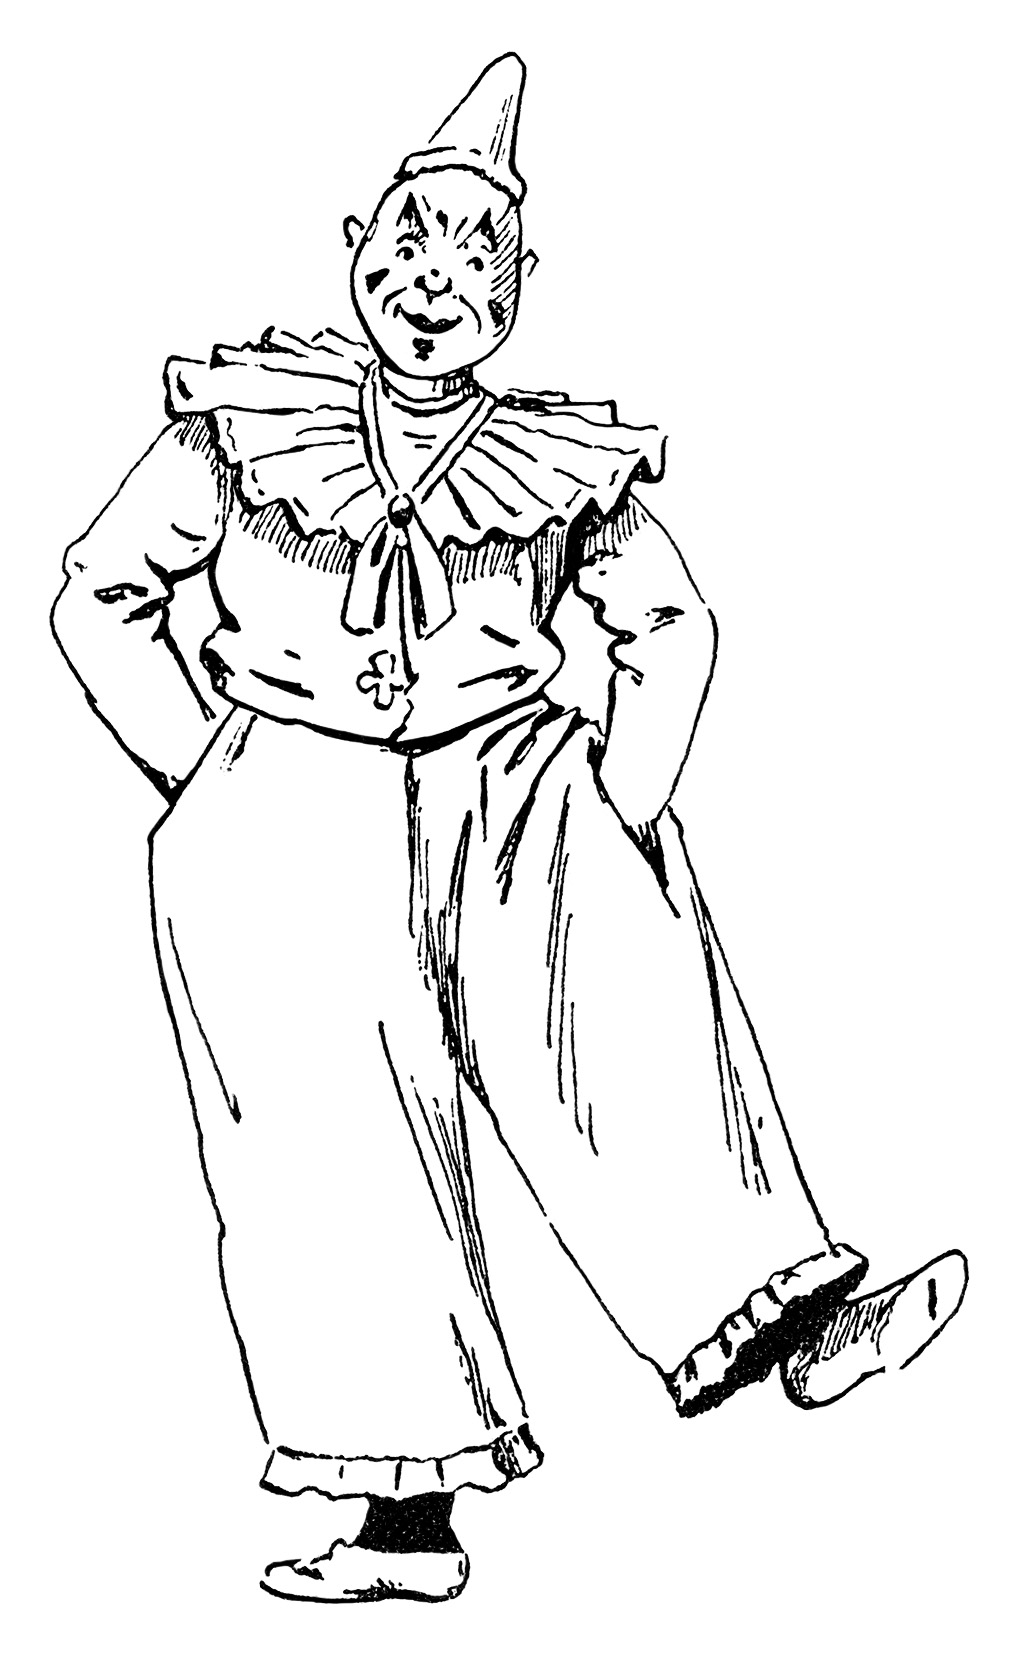 Circus Clown ~ Free Vintage Clip Art Image   Old Design ...